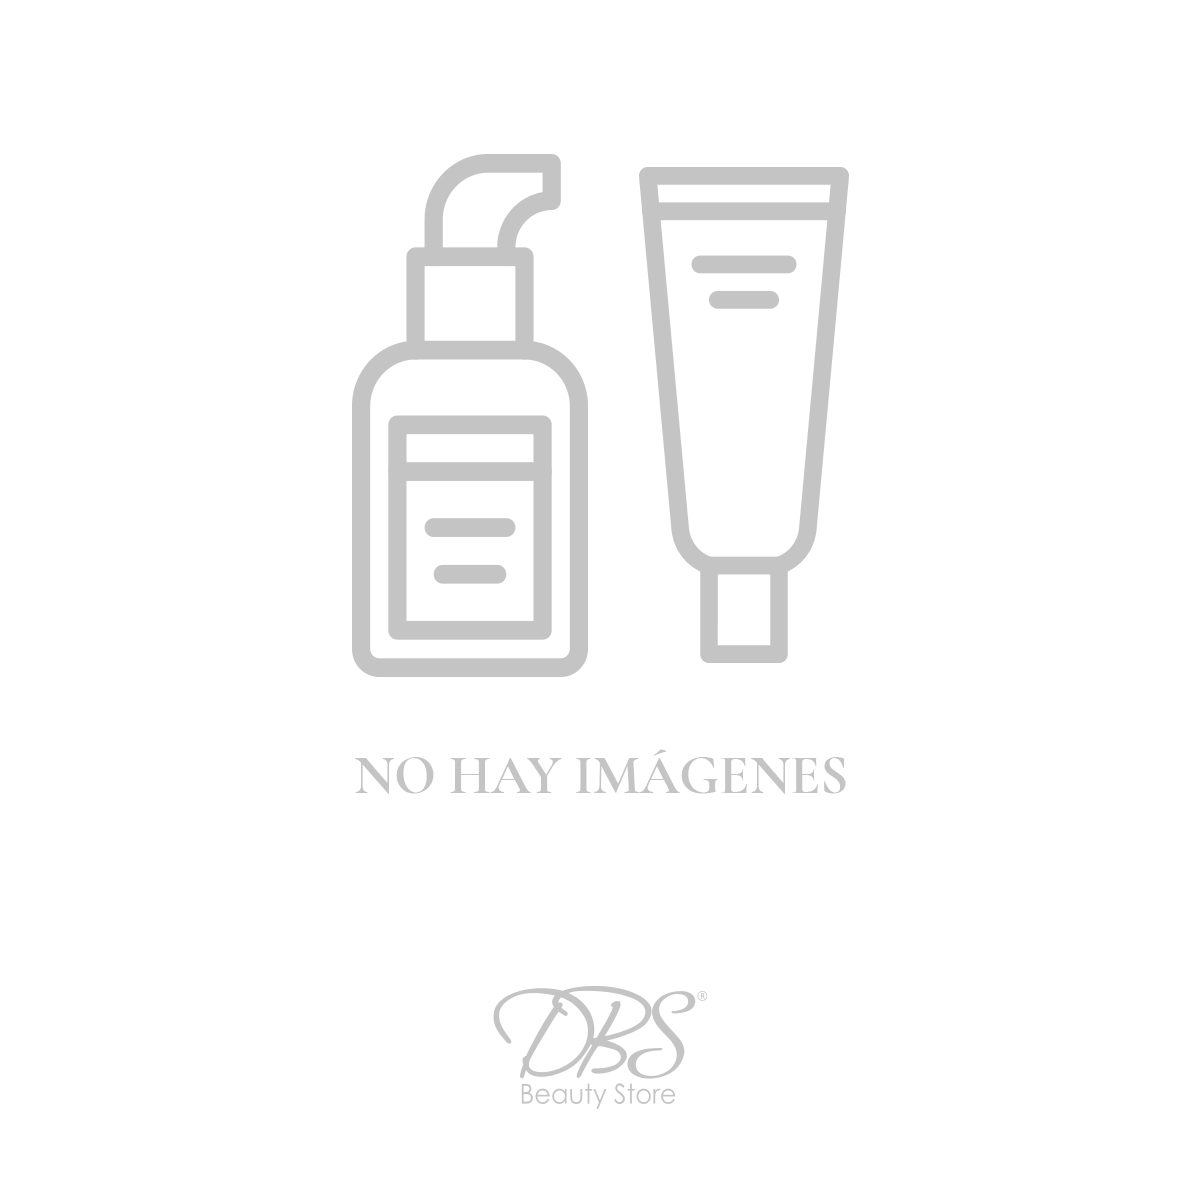 dirty-works-DW-16131.jpg